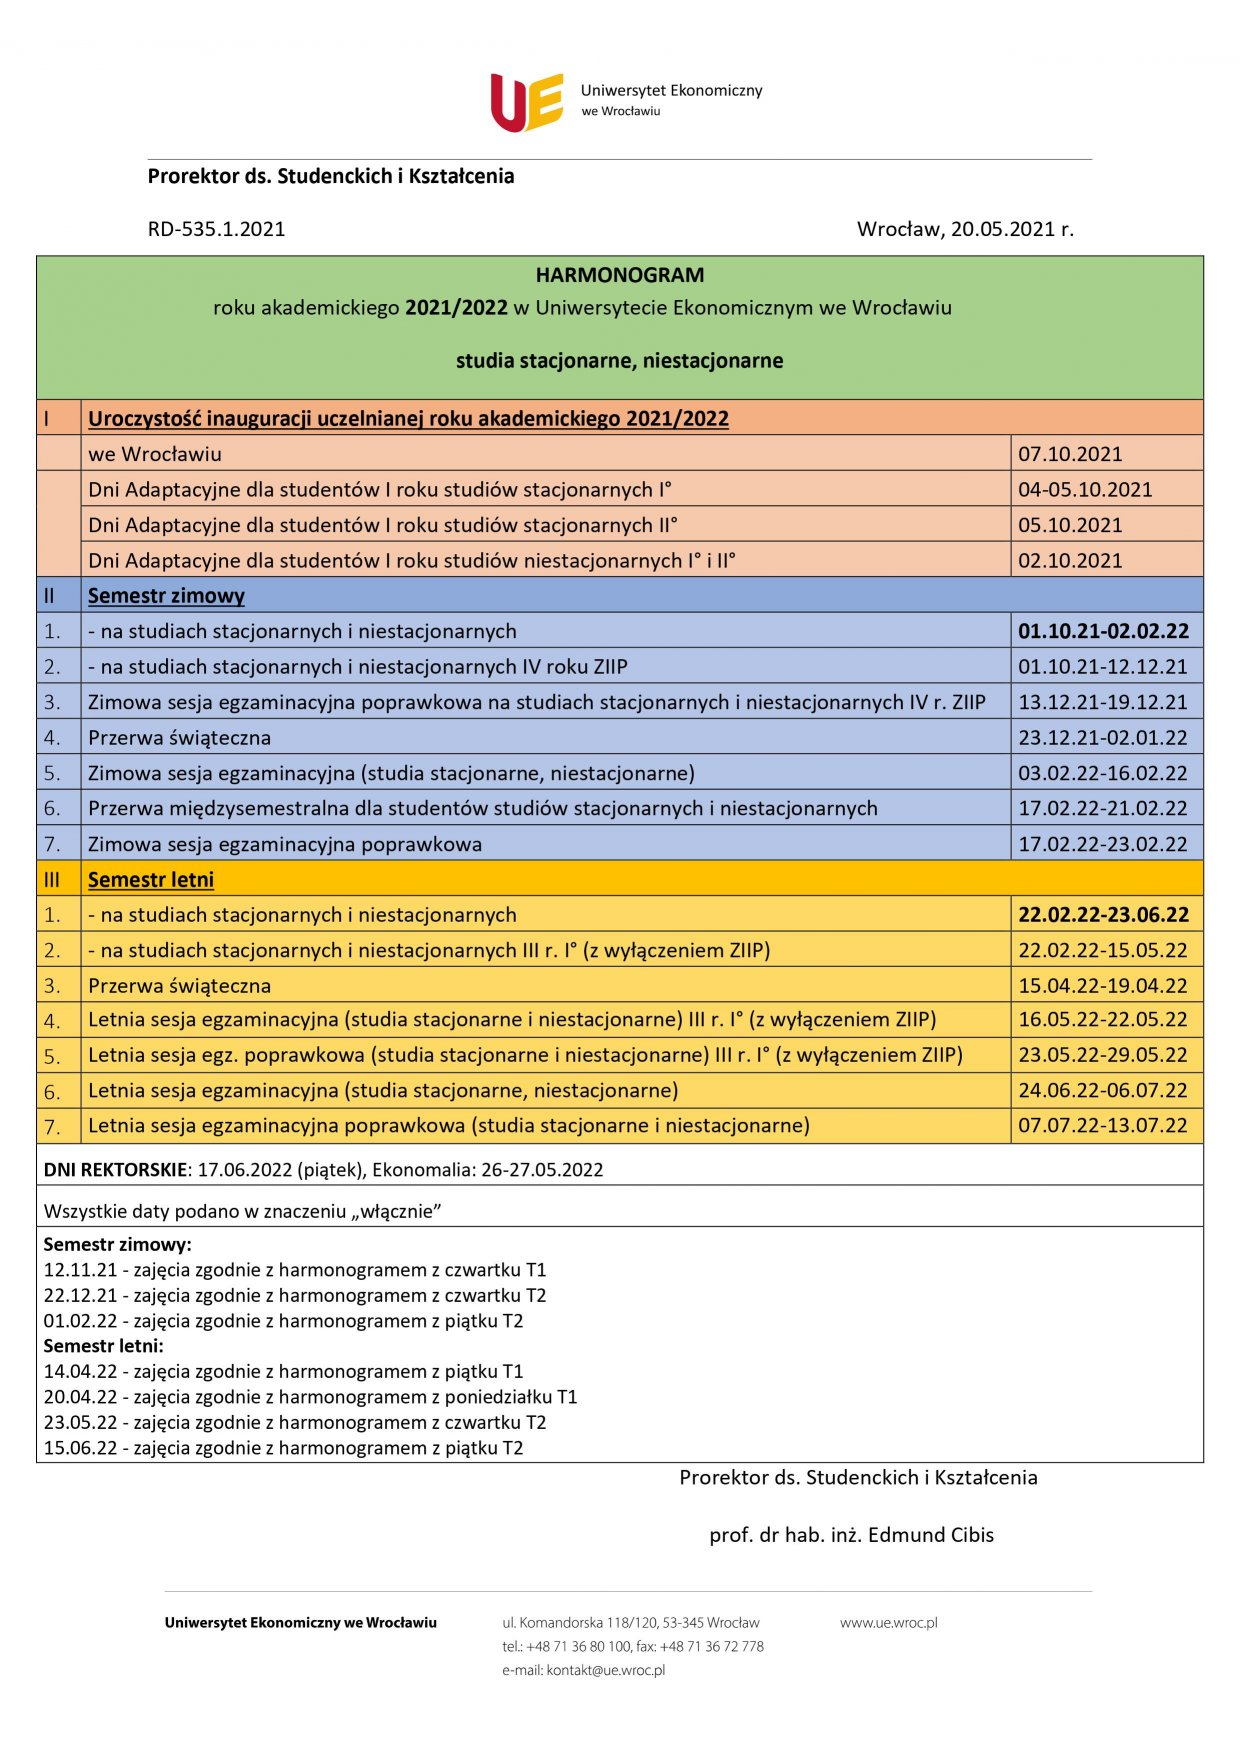 _resized_1240x1755_harmonogram_2021_2022